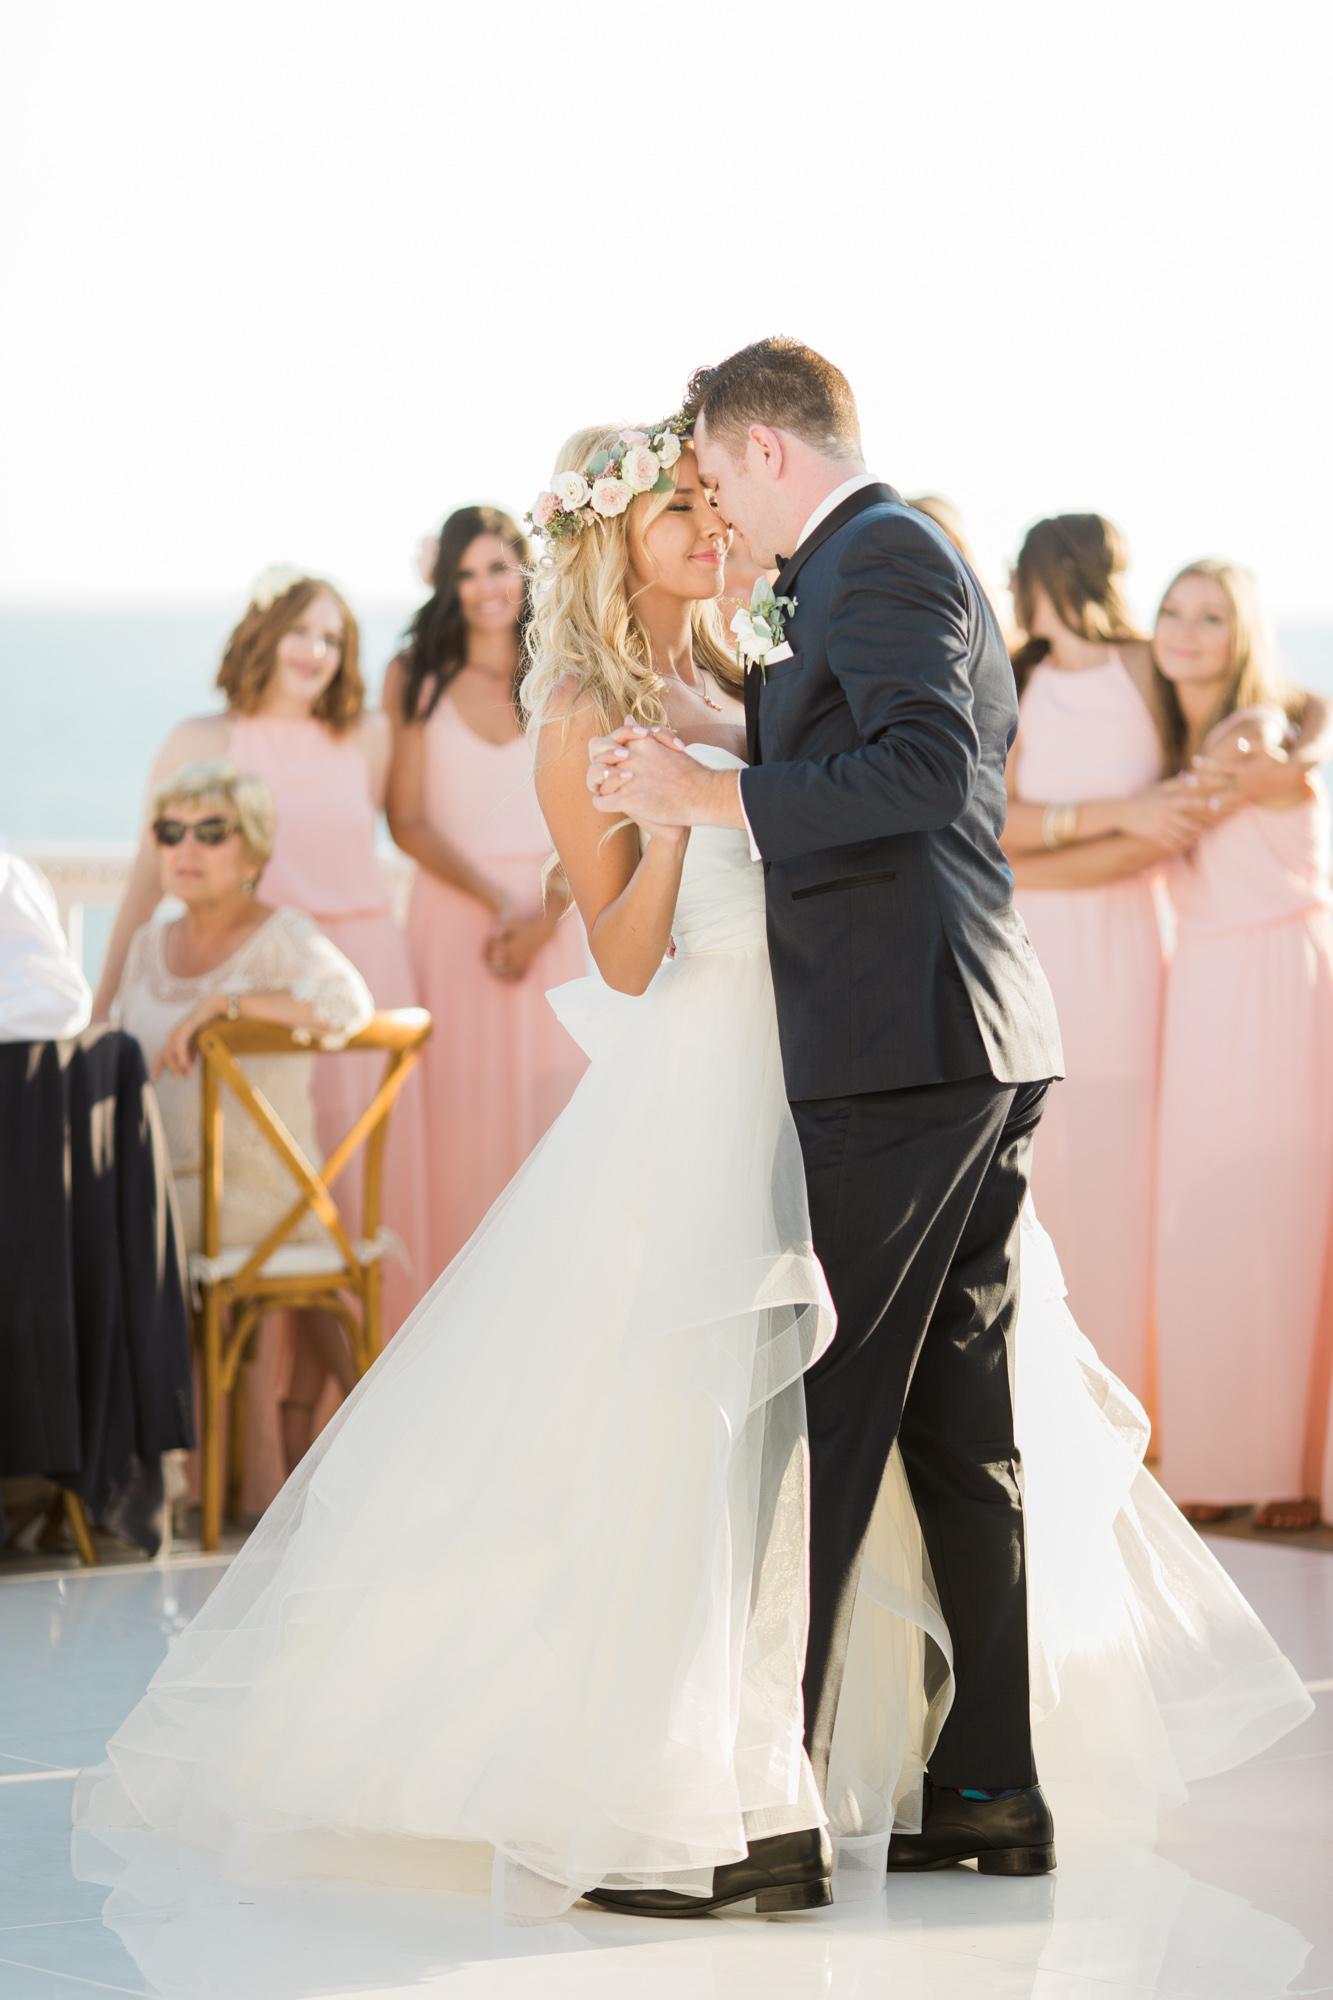 Orange_County_Laguna_Beach_Bride_Groom_Wedding_Hair_Makeup_10.jpg